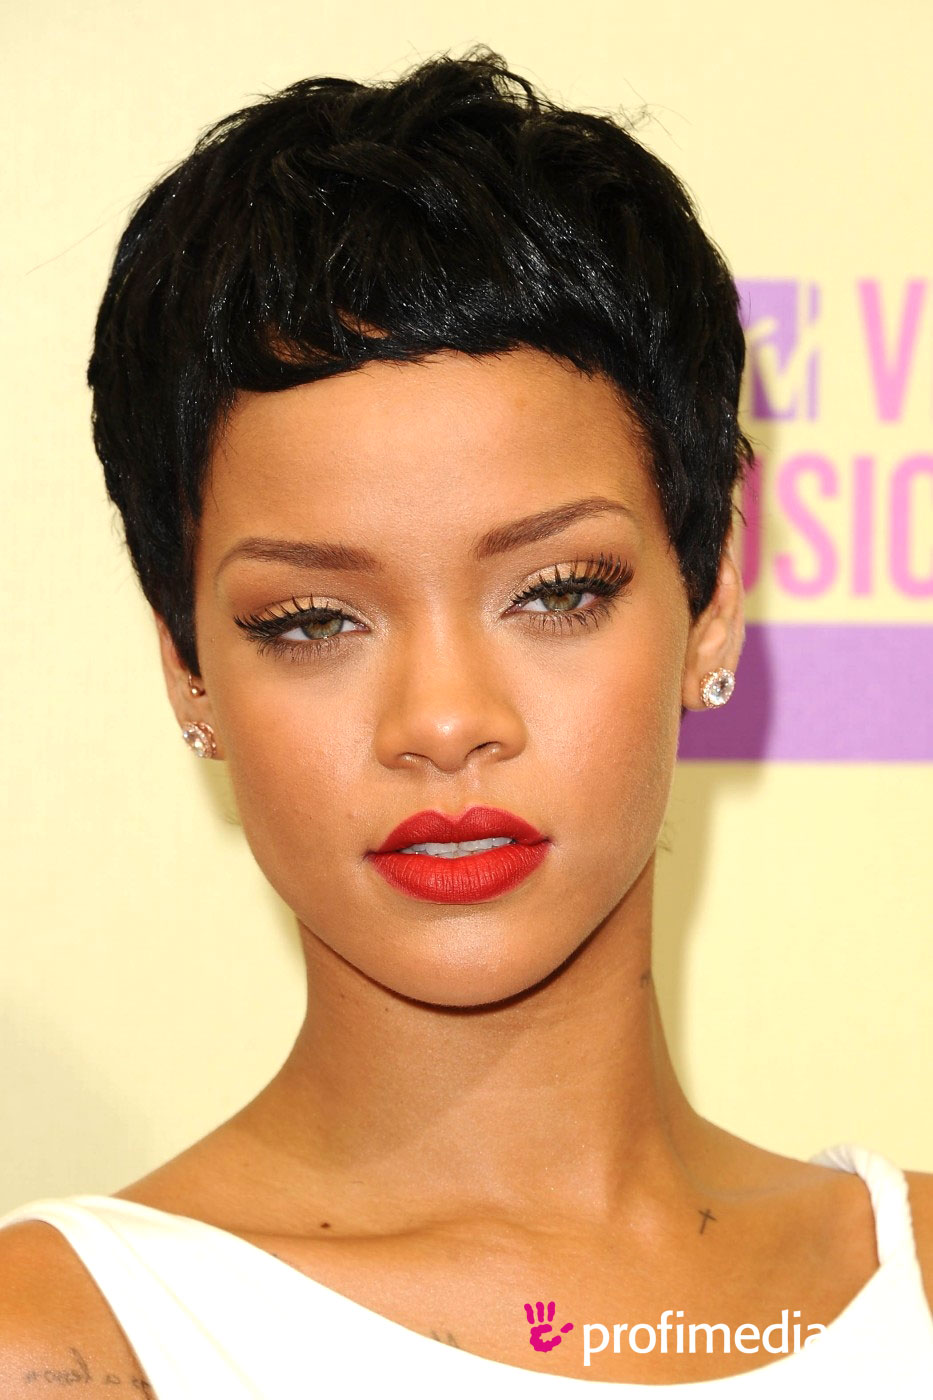 Rihanna - - hairstyle - easyHairStyler Rihanna